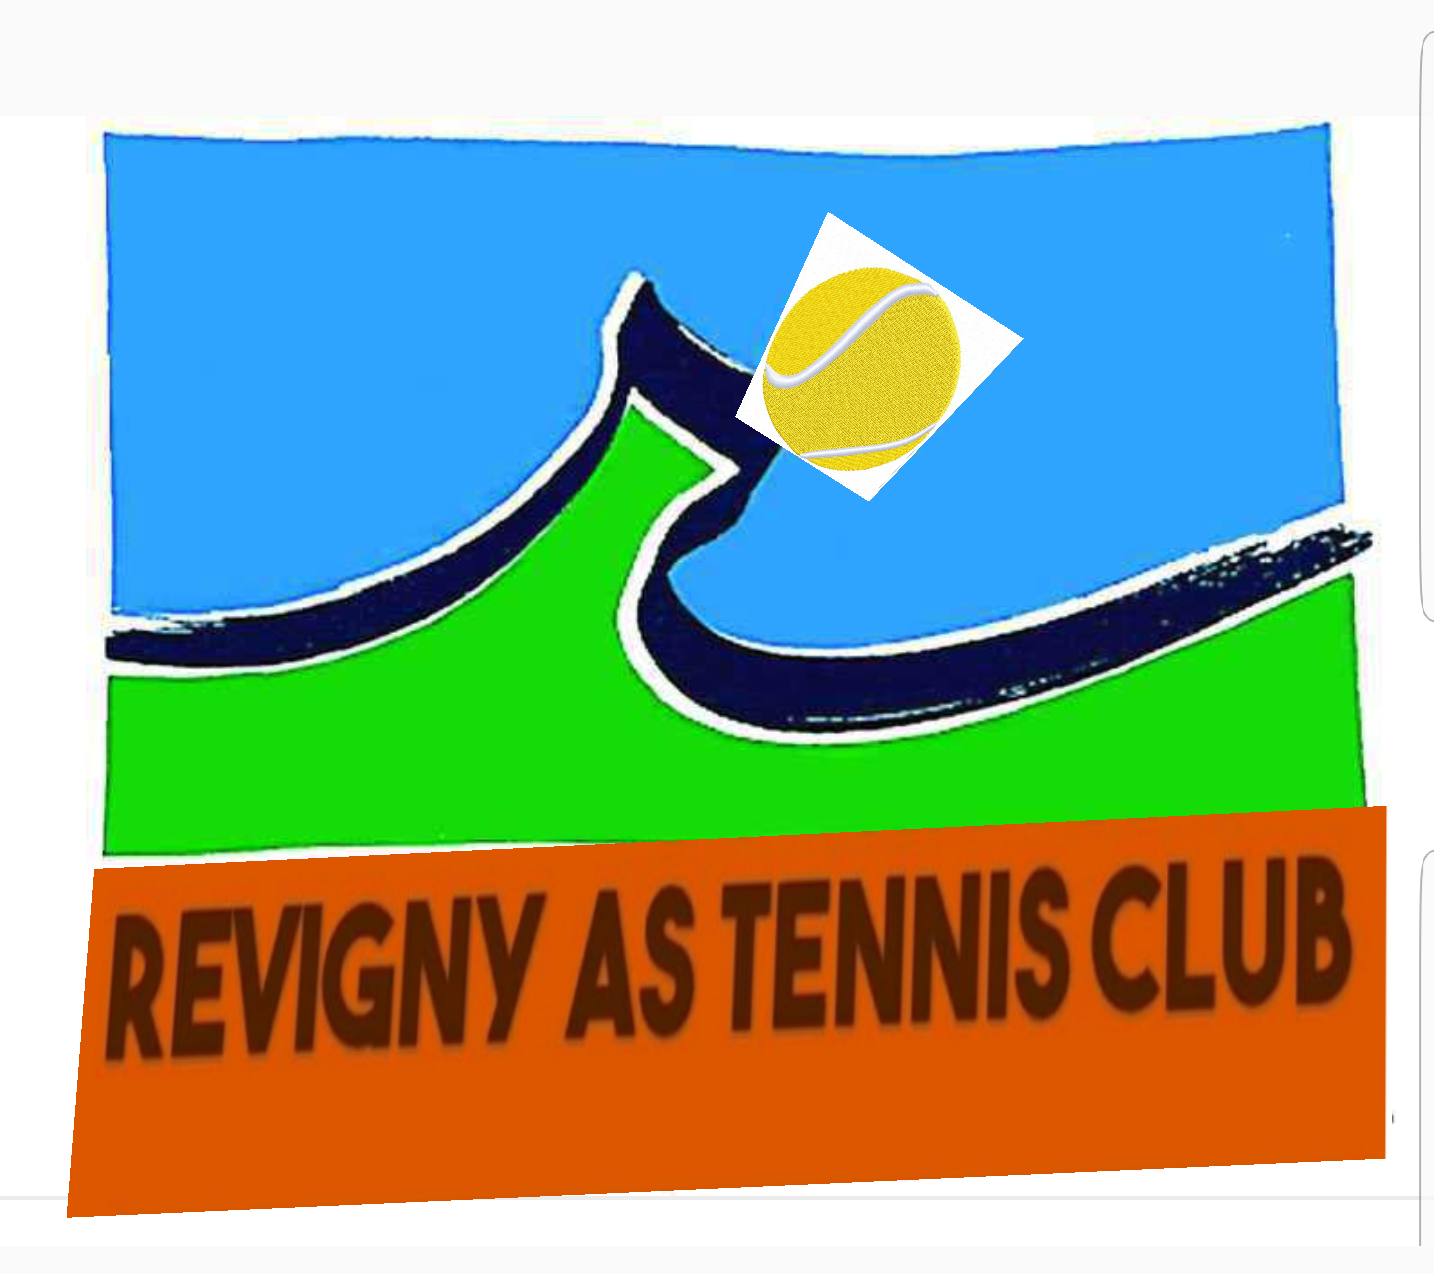 ASTC Revigny